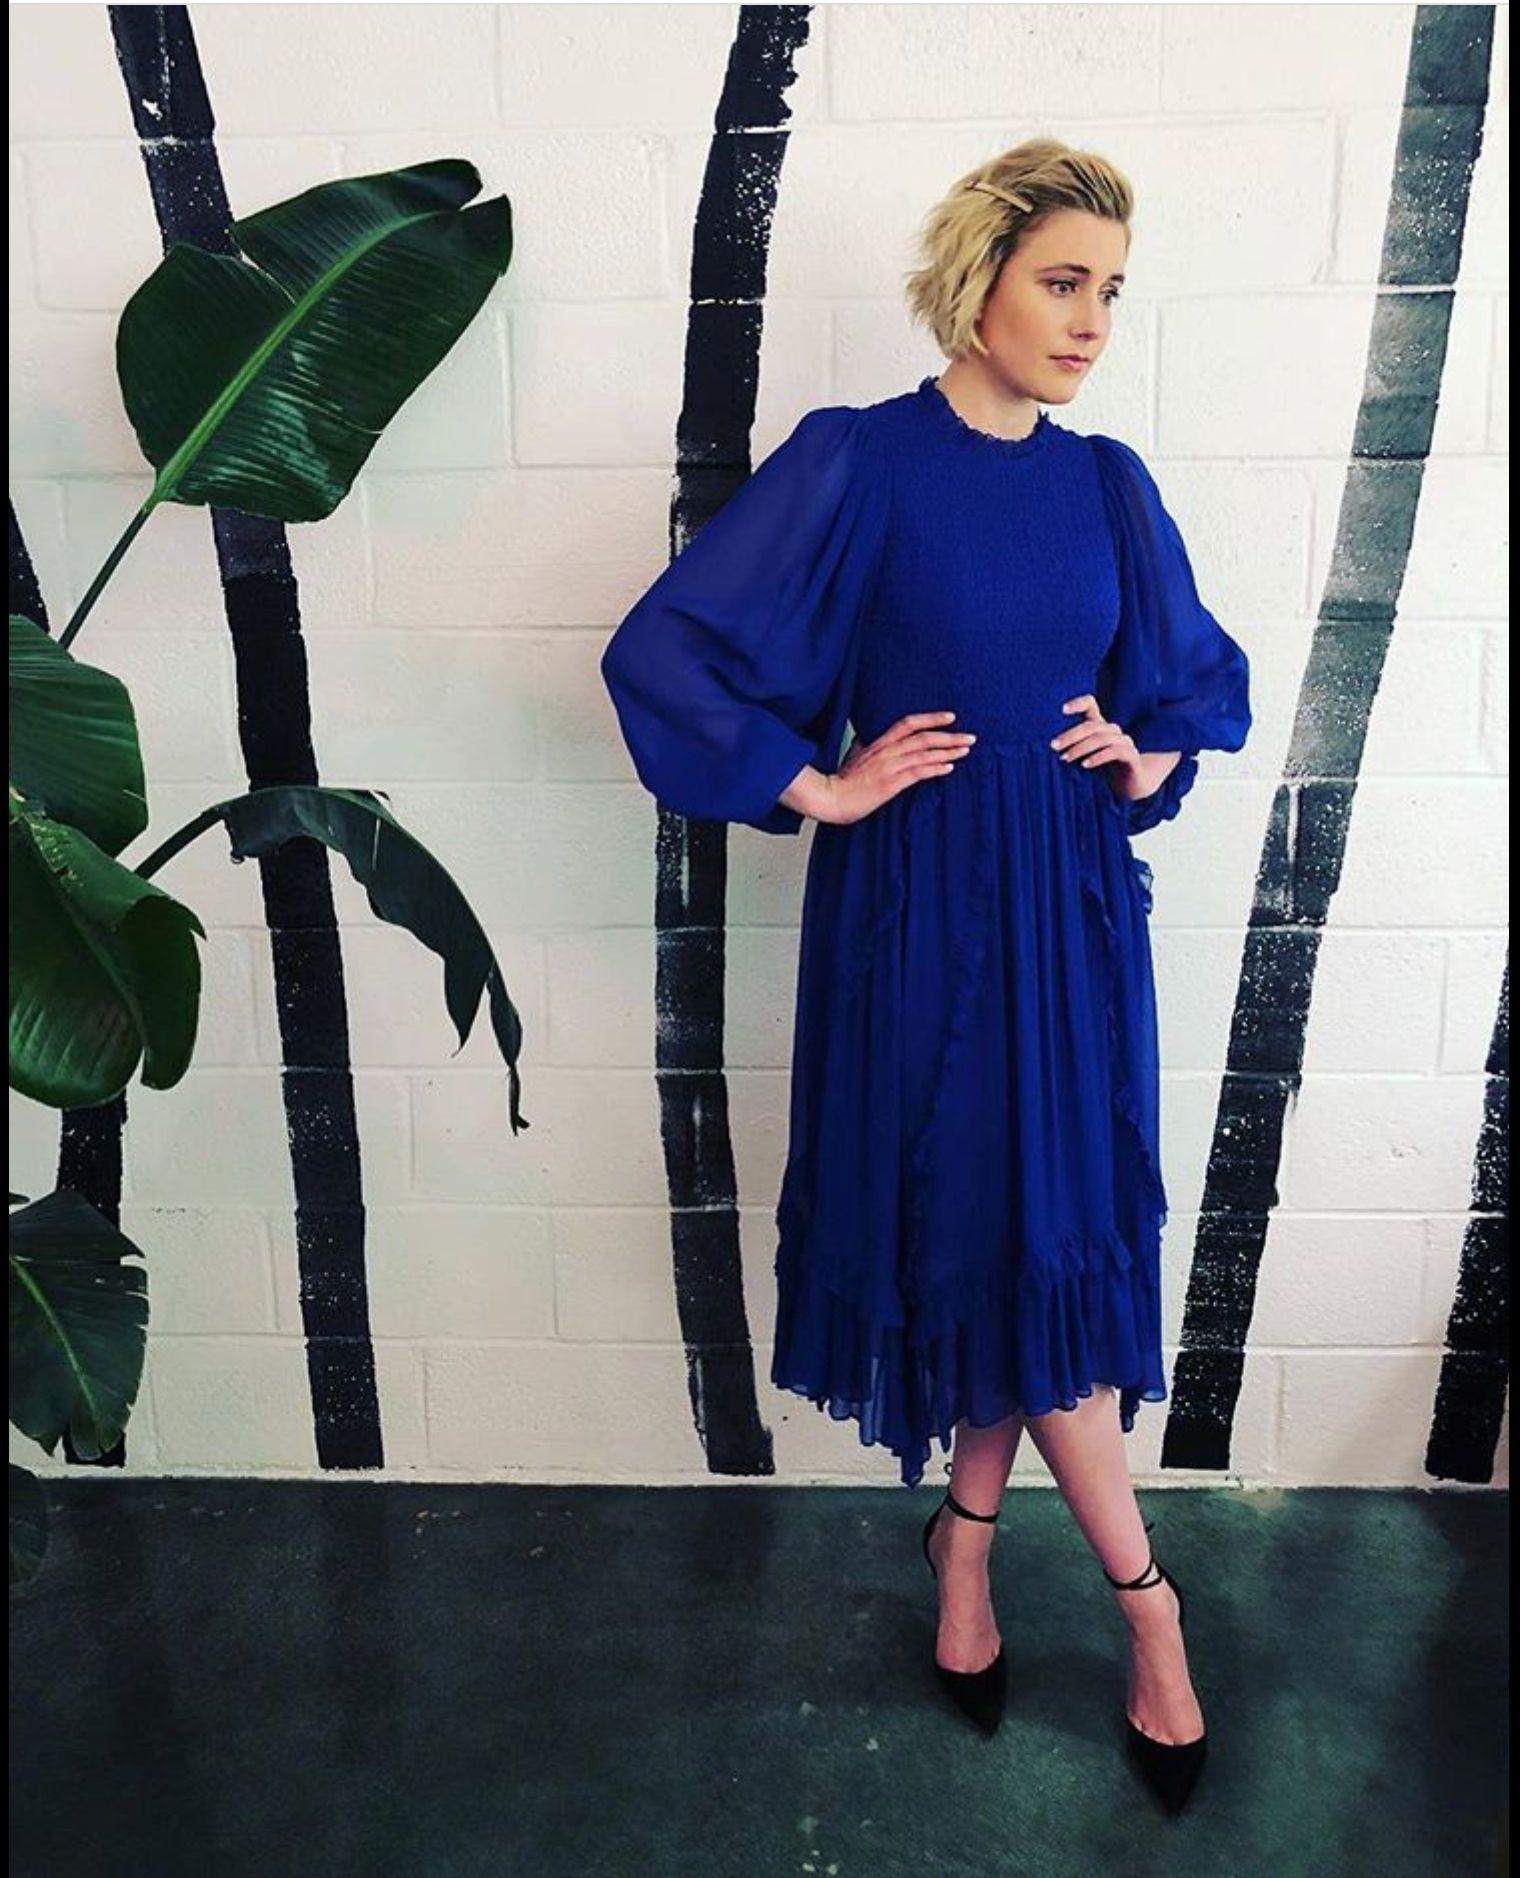 3725529715f Greta wearing the Ulla Johnson  Arielle Dress  from Pre-Fall 2018   ullajohnson  gretagerwig  cobalt  prefall